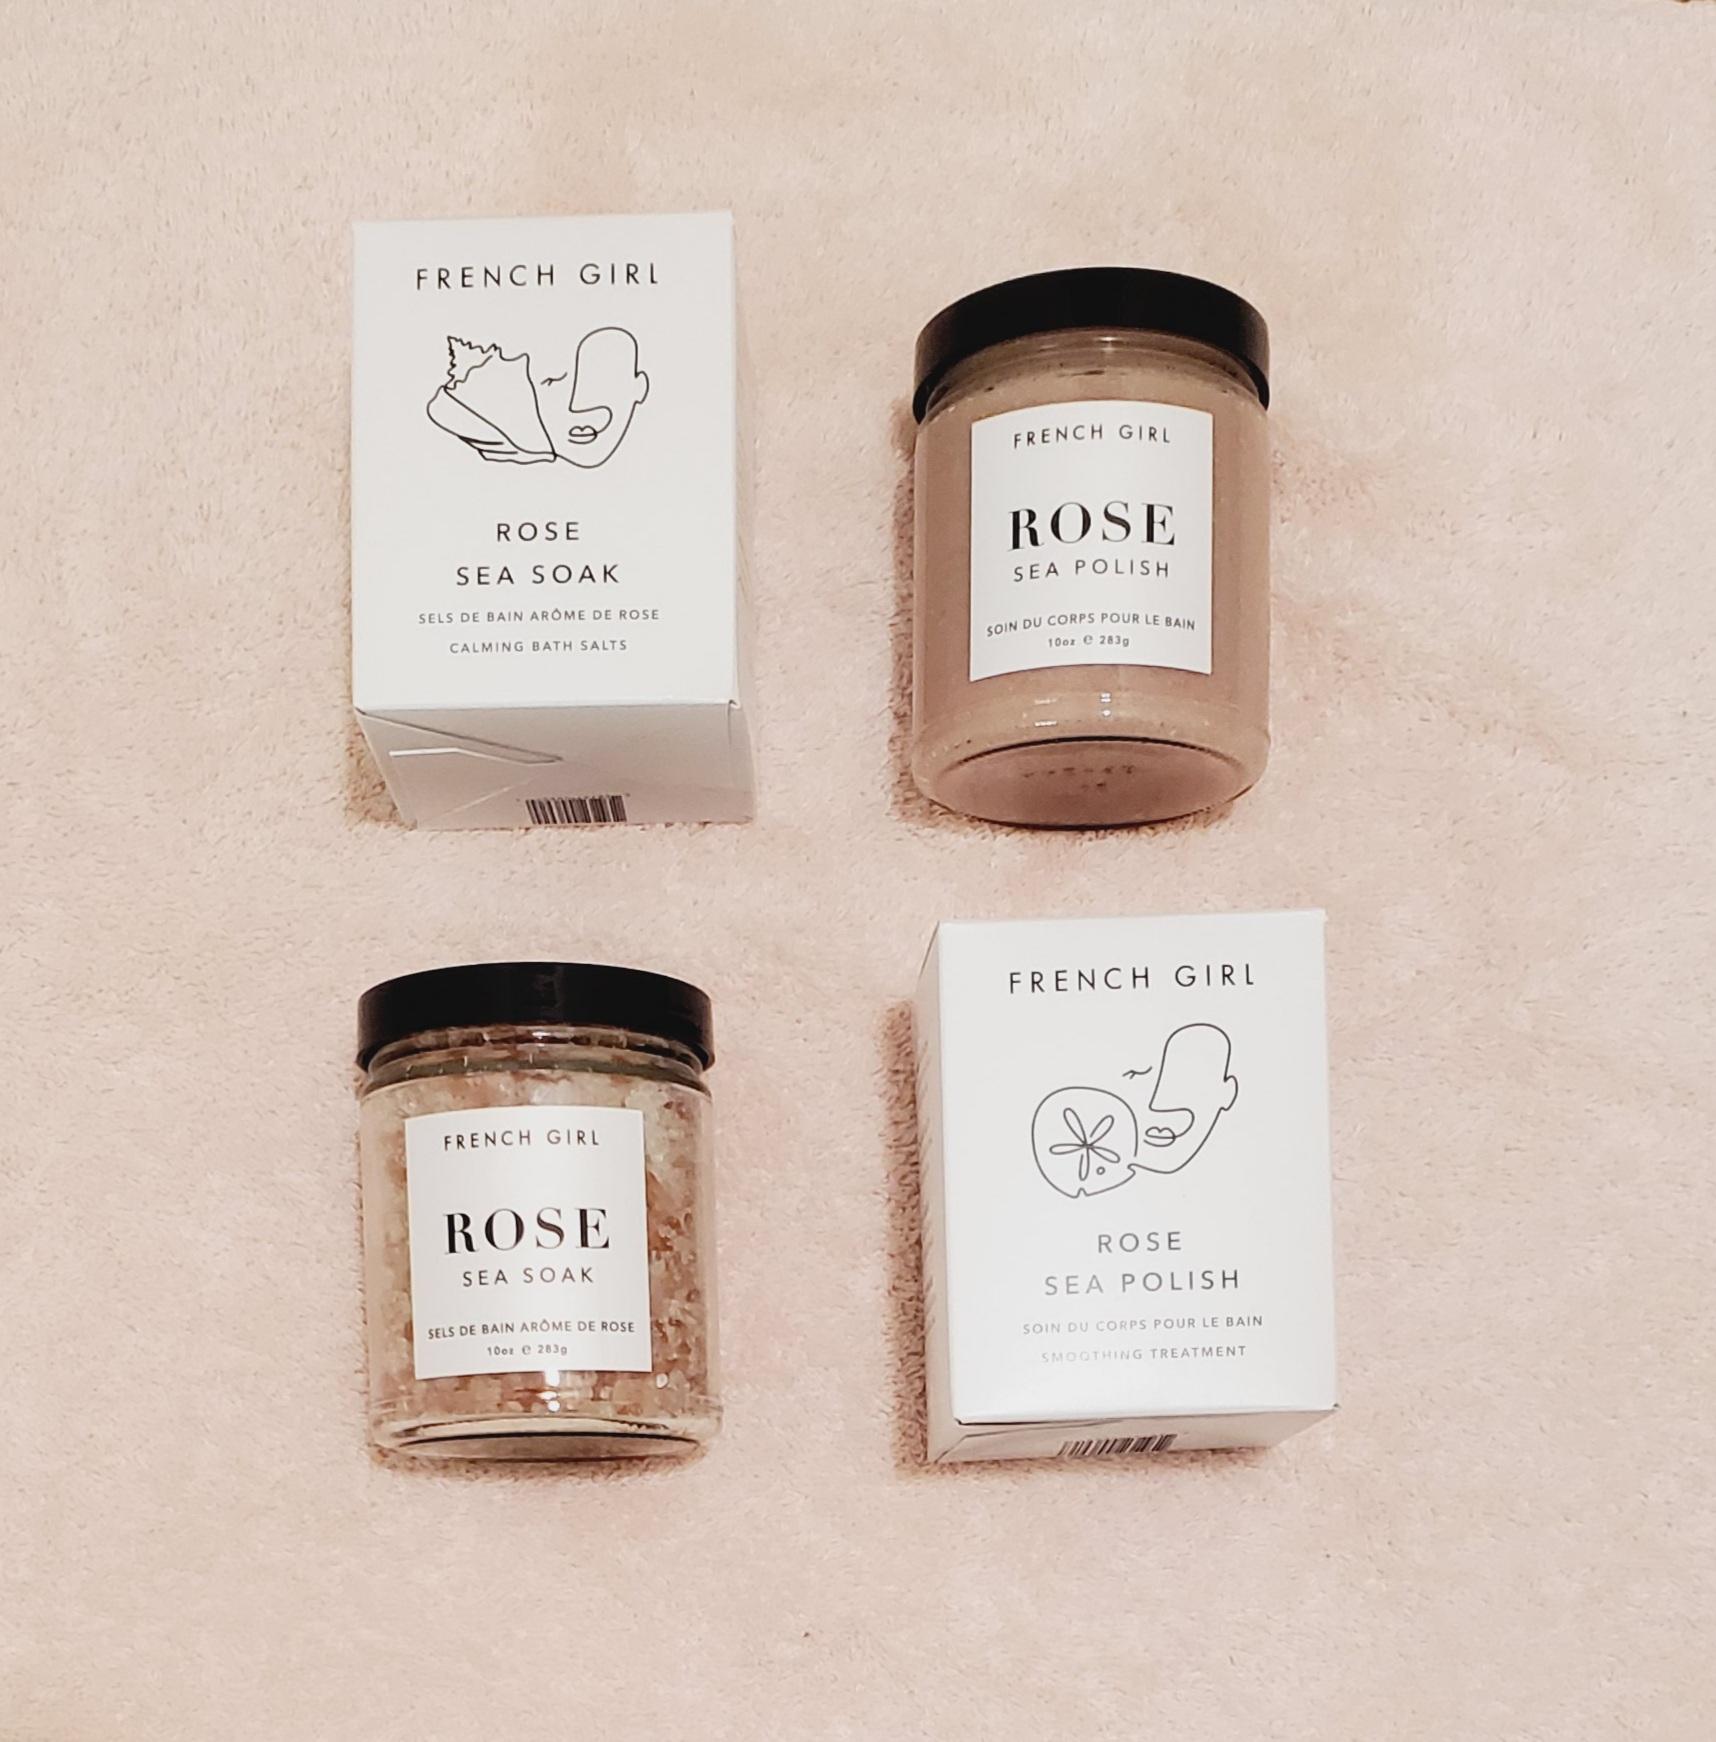 Product Review: French Girl Organics Rose Sea Soak